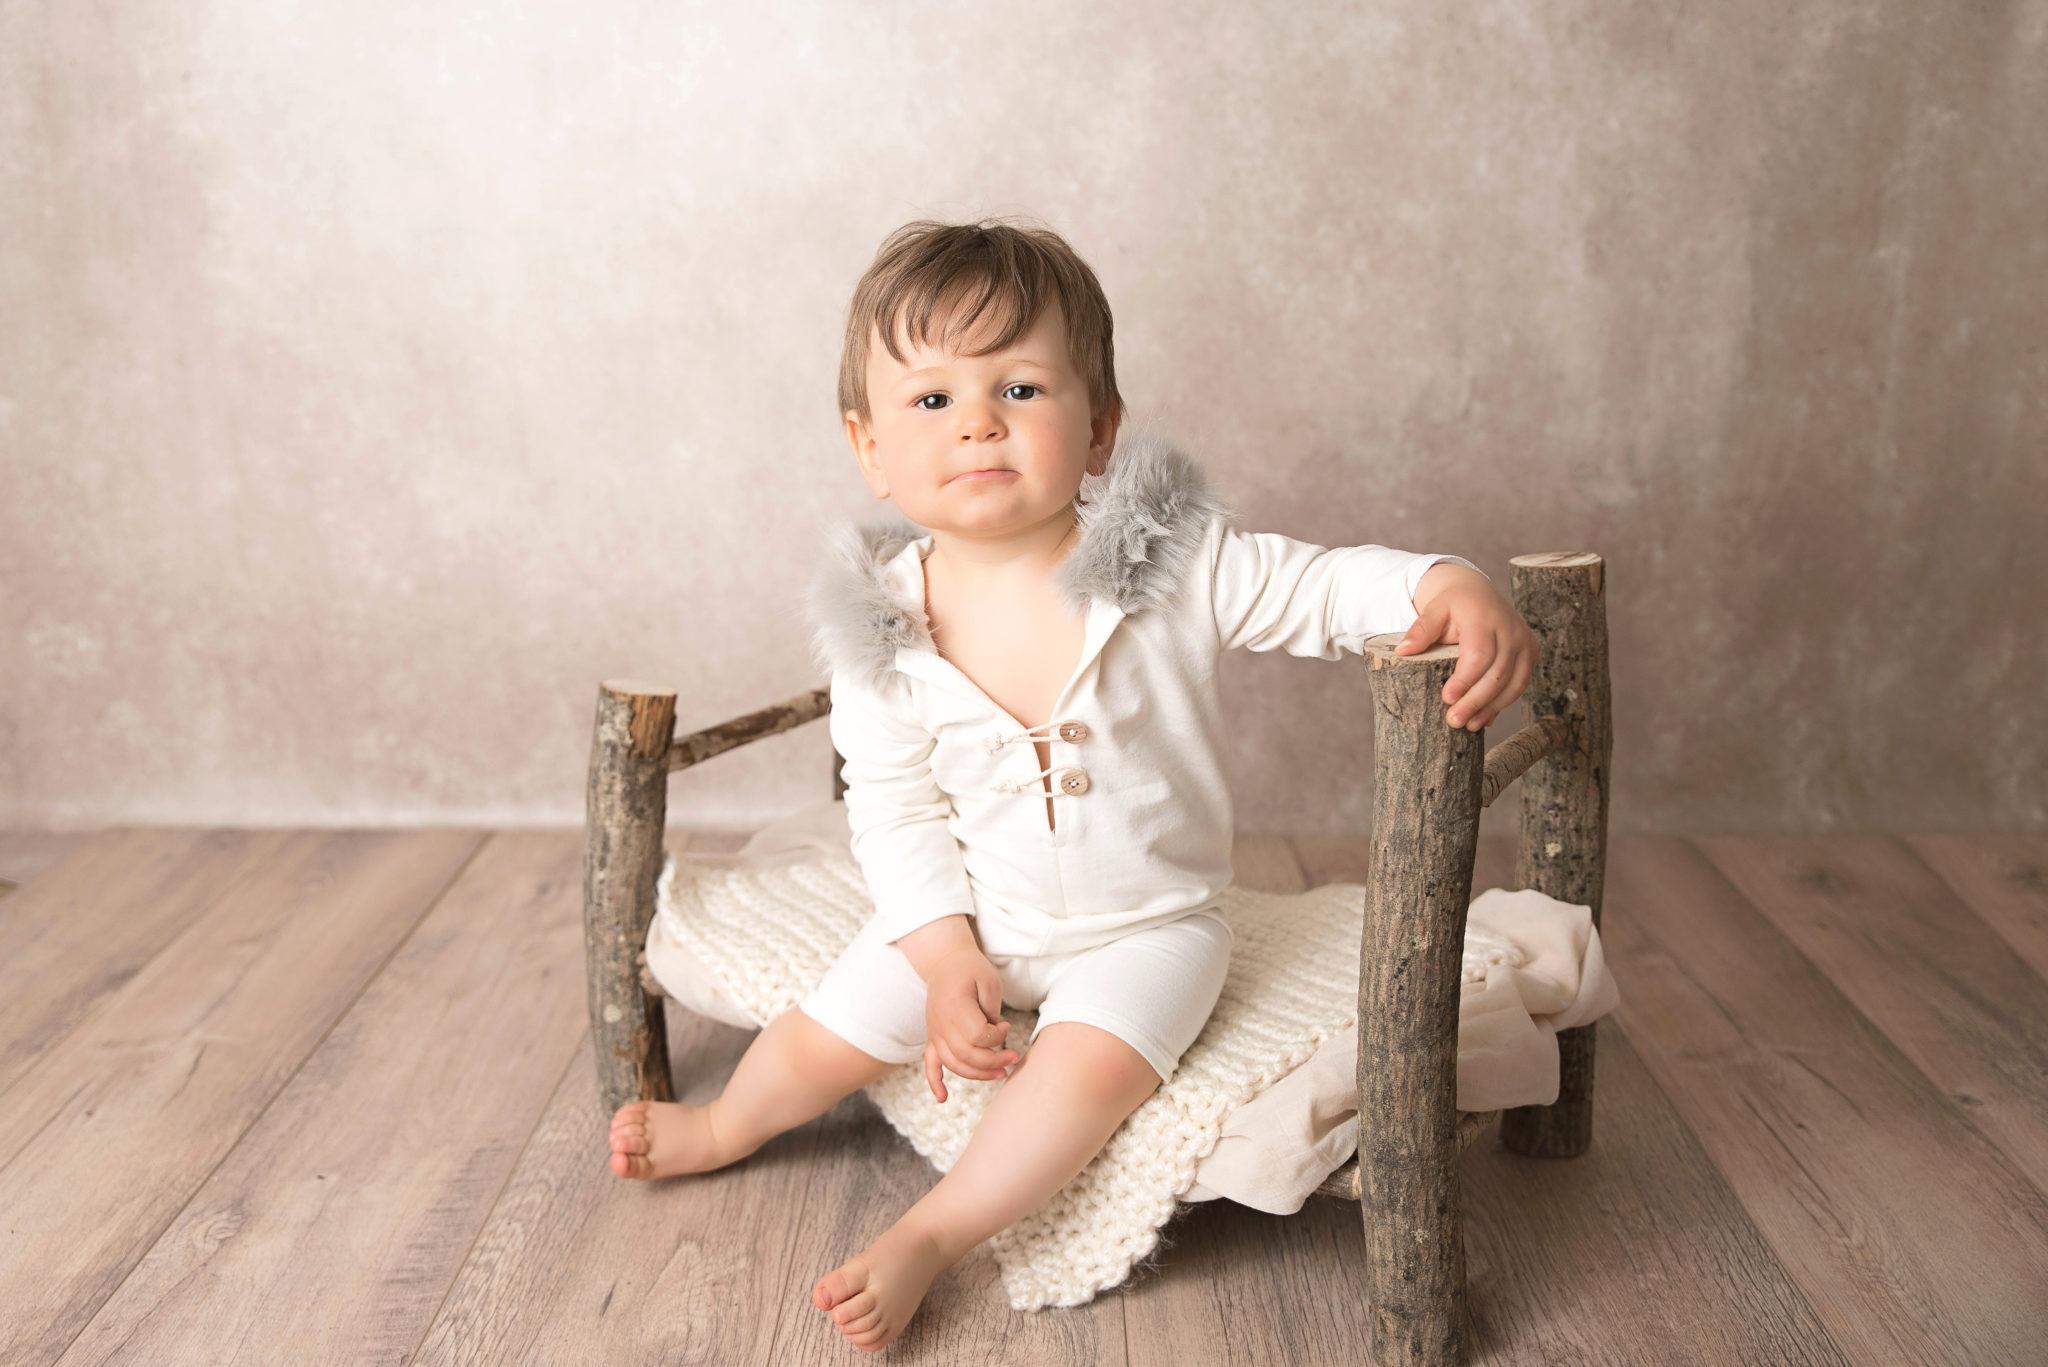 Photographe bébé oise seine et marne val d'oise ainse (39)